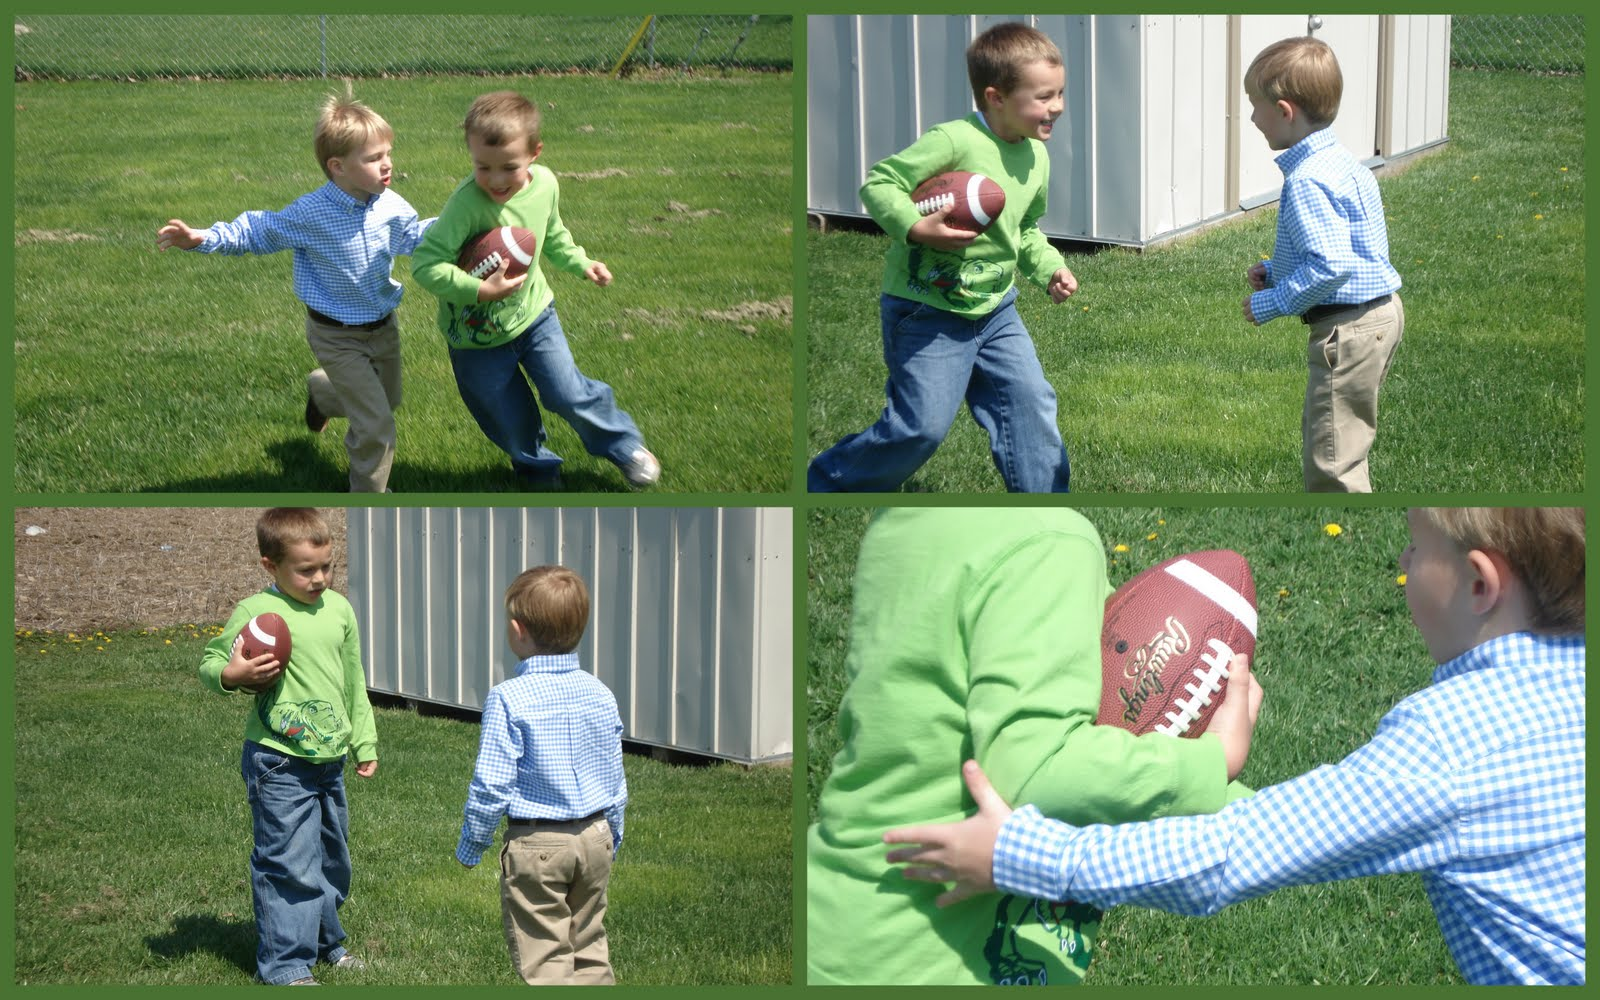 andrew and clayton playing backyard football